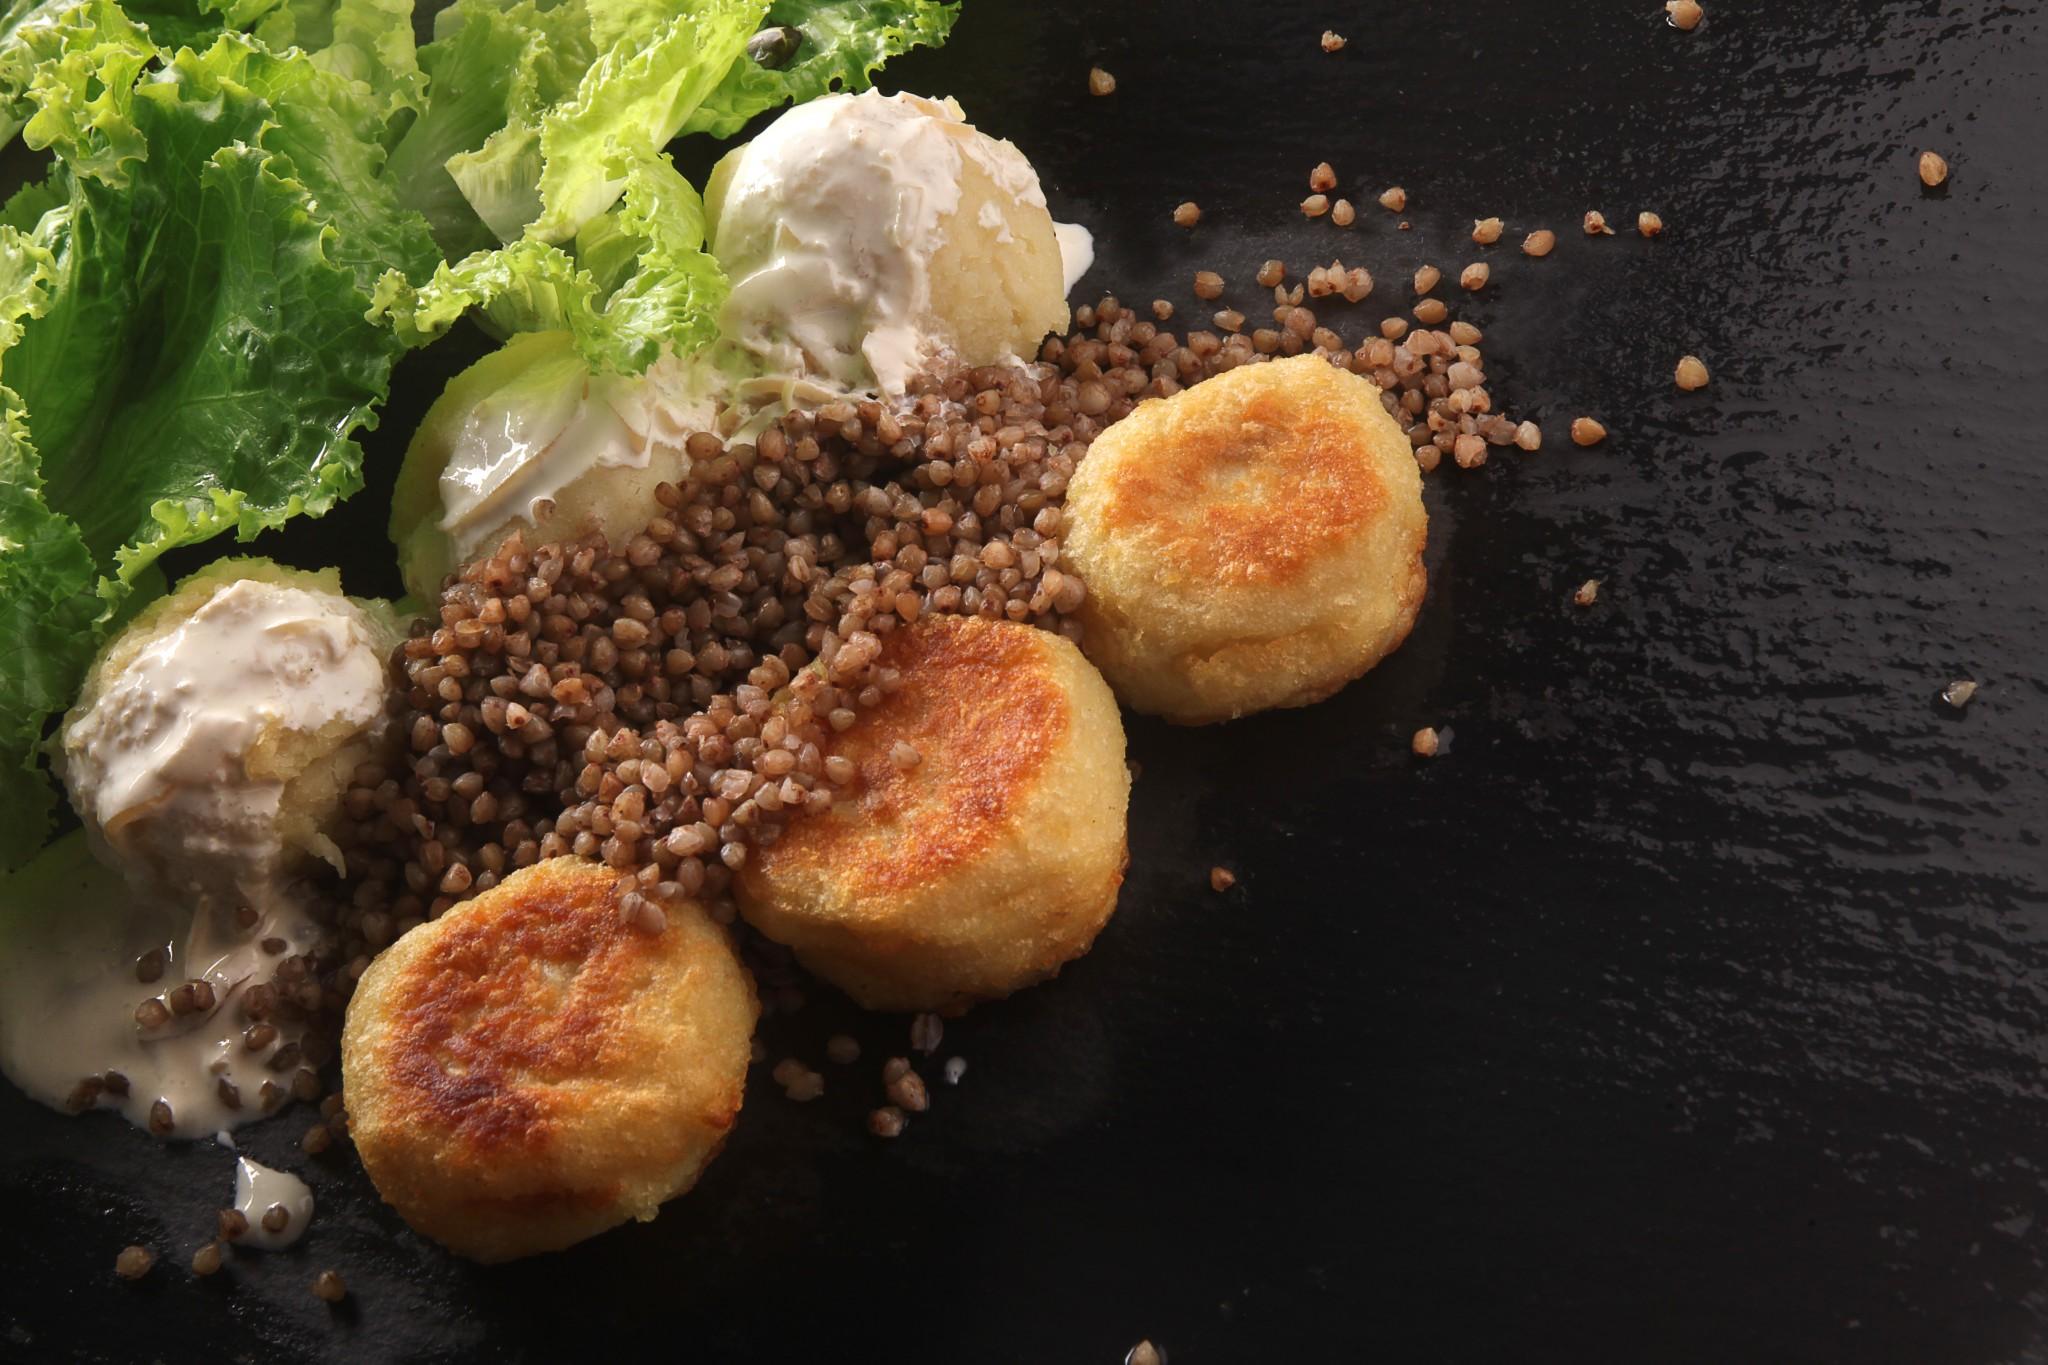 Tradicionalne slovenske prekmurske jedi